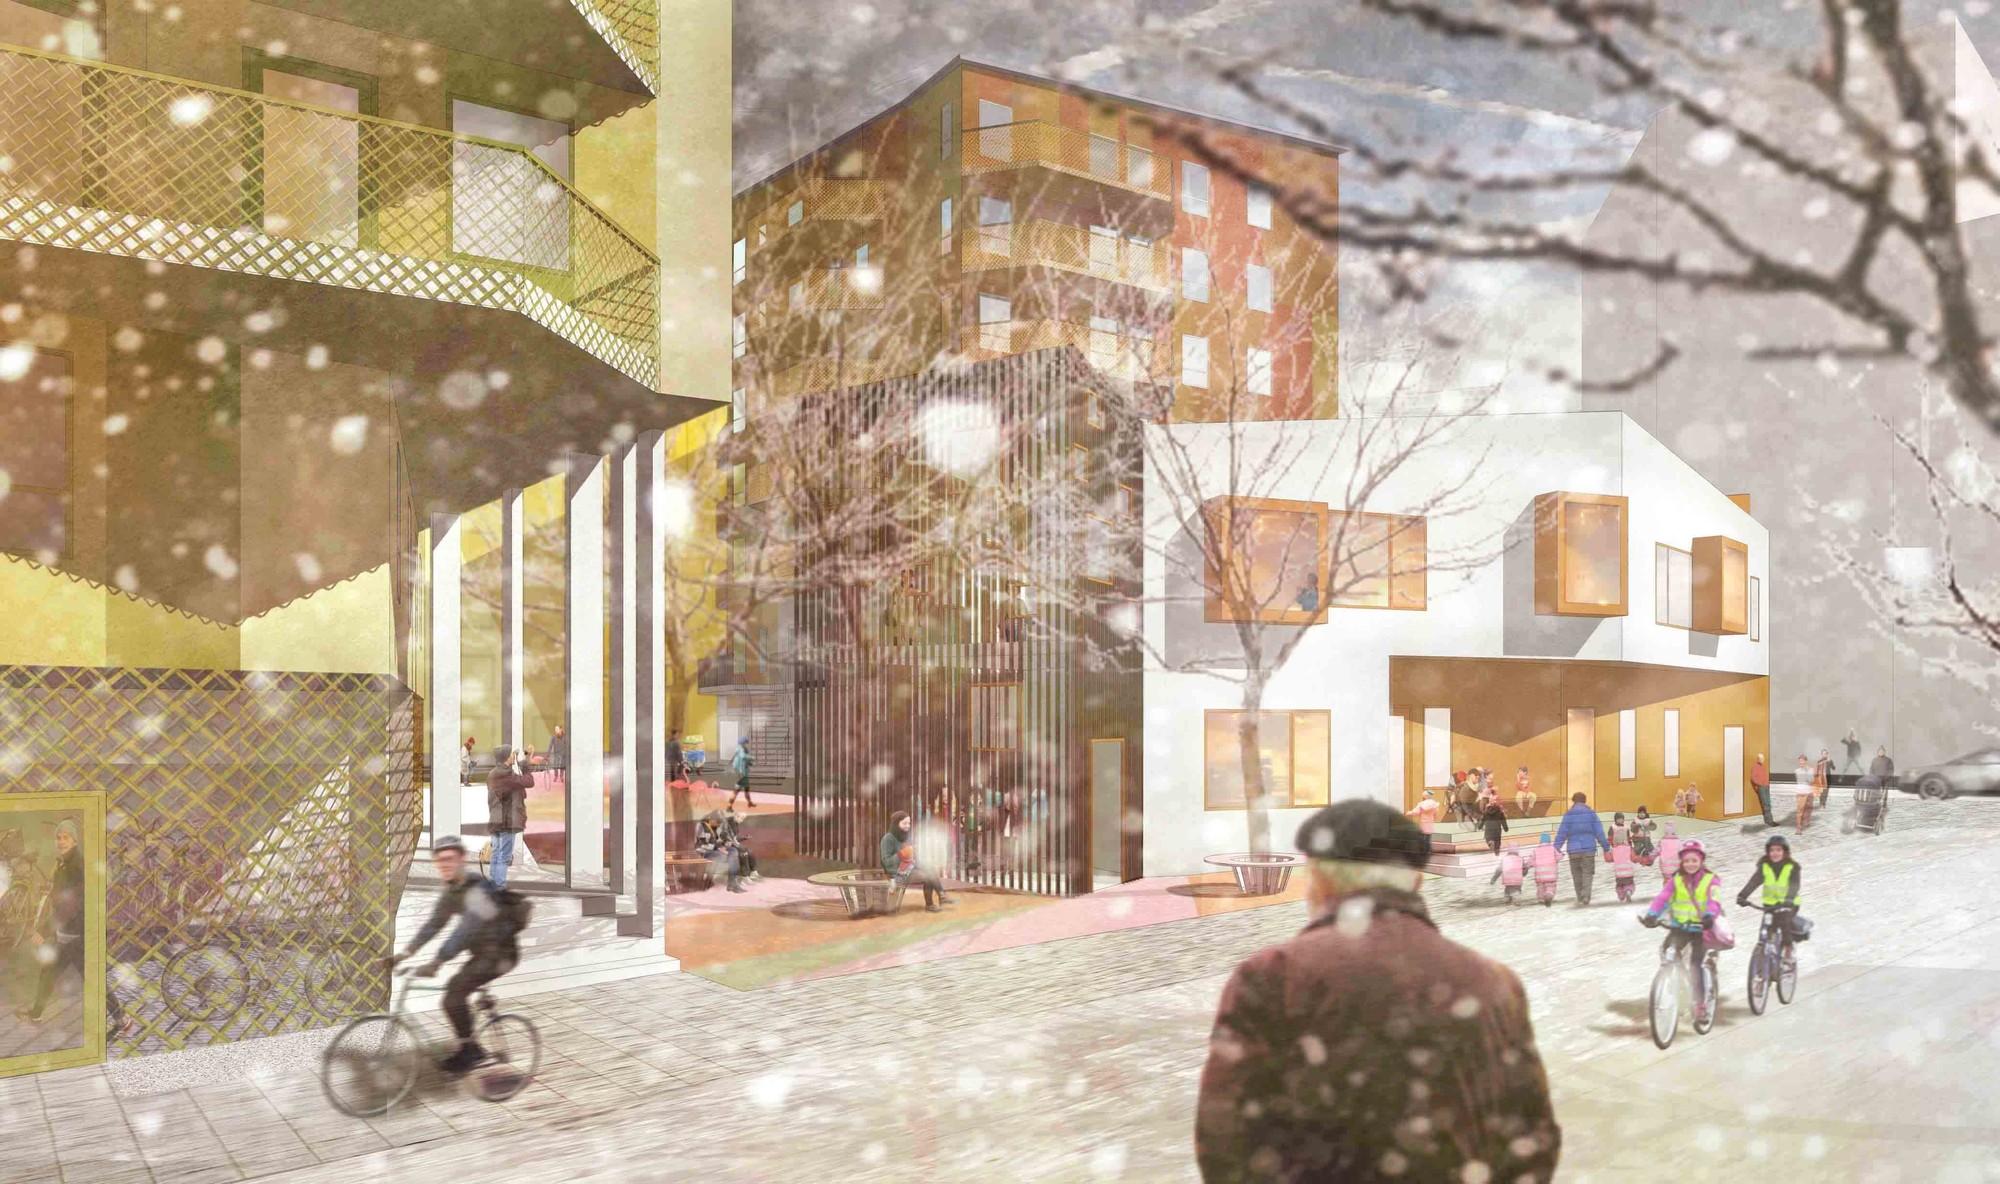 Årstafältet Housing Proposal / GRAD Arkitekter, © Ásdís Andersdóttir